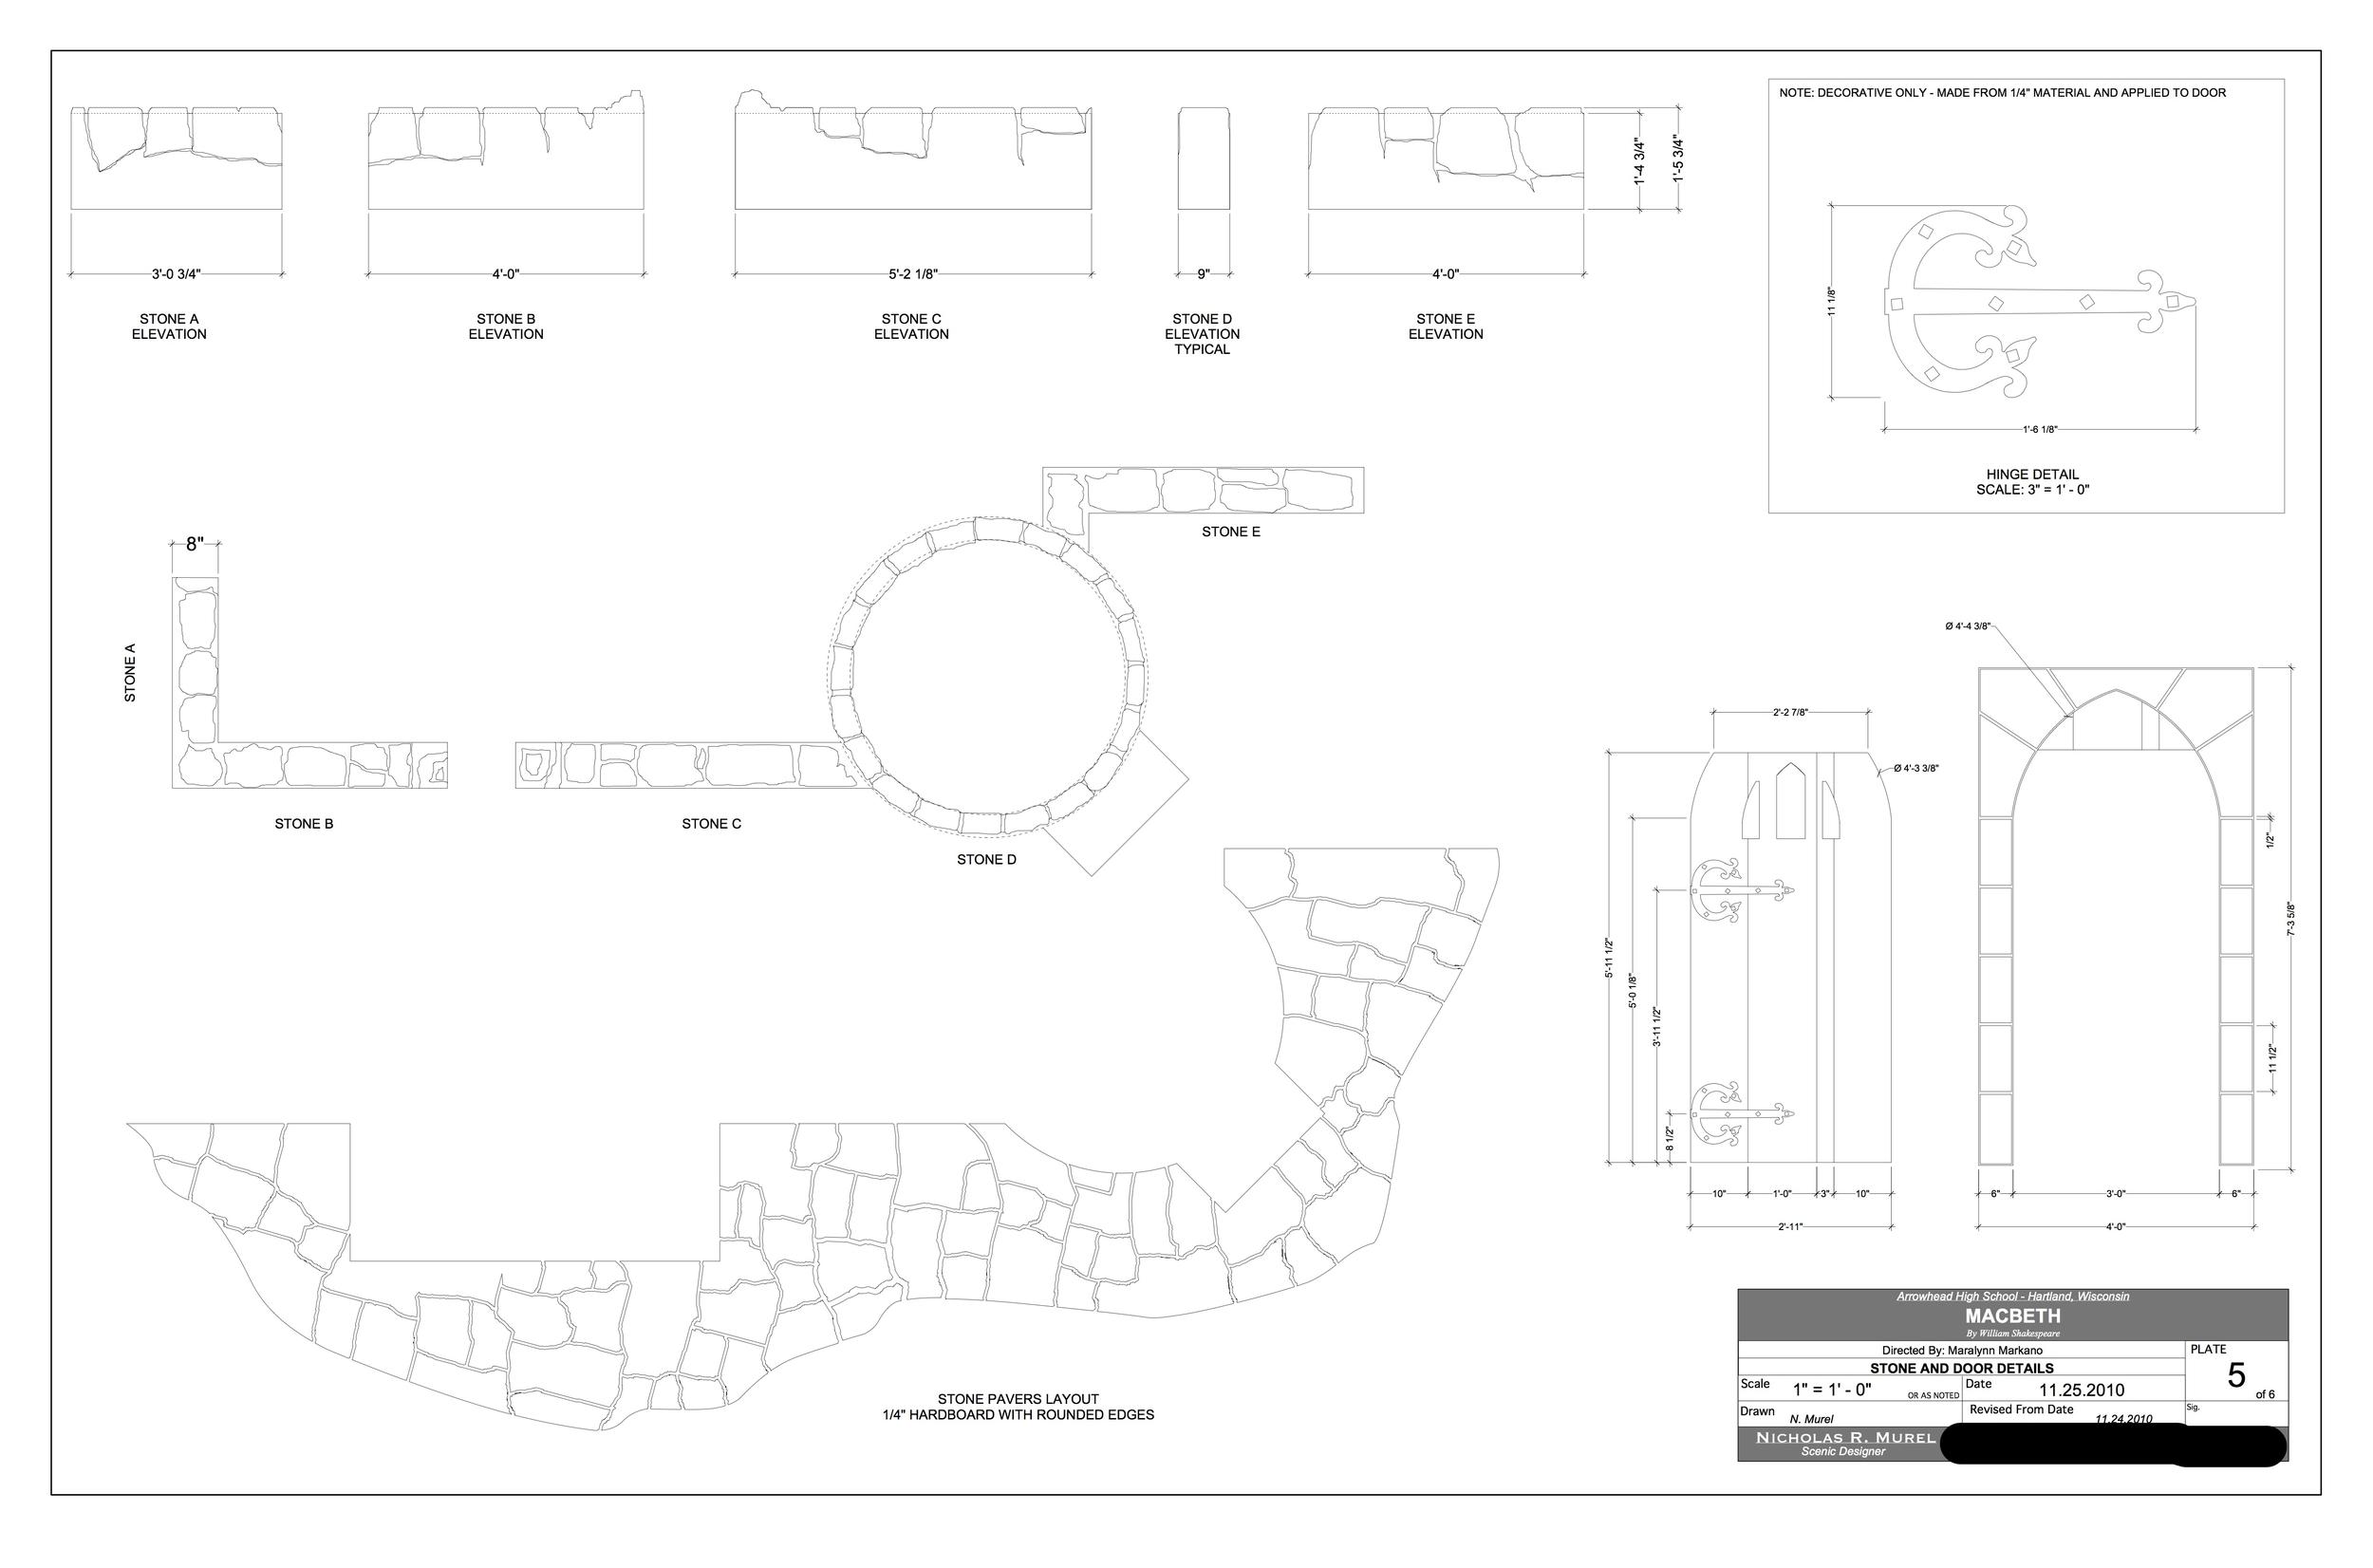 11.25 PLATE 5 - STONE AND DOOR DETAIL.jpg